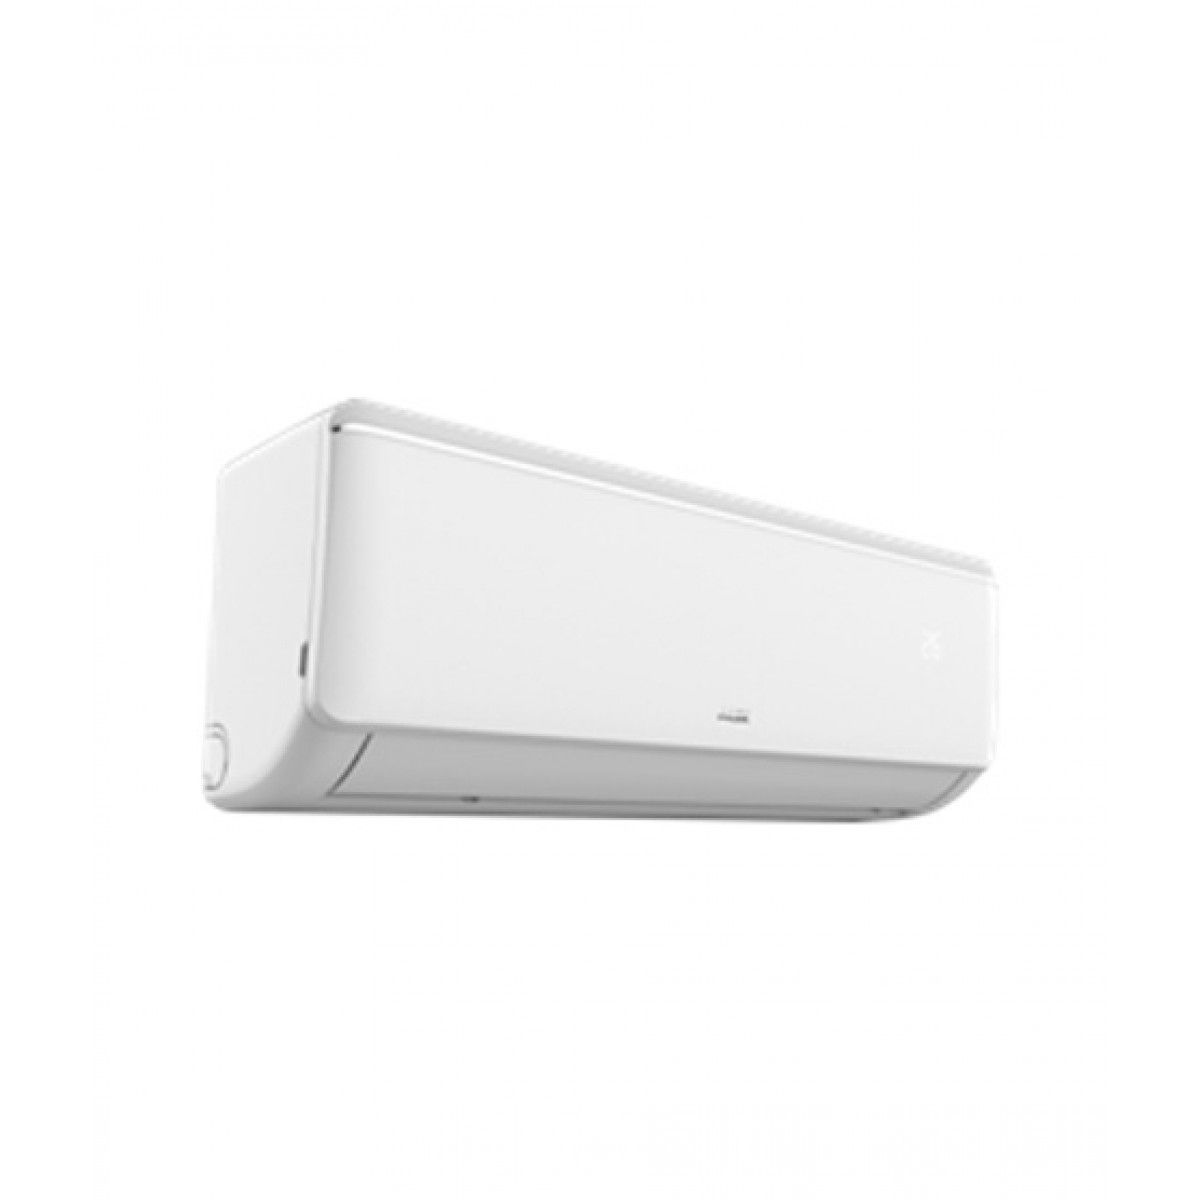 PEL Majestic 4D Split Air Conditioner 1.0 Ton (PSAC-12K)